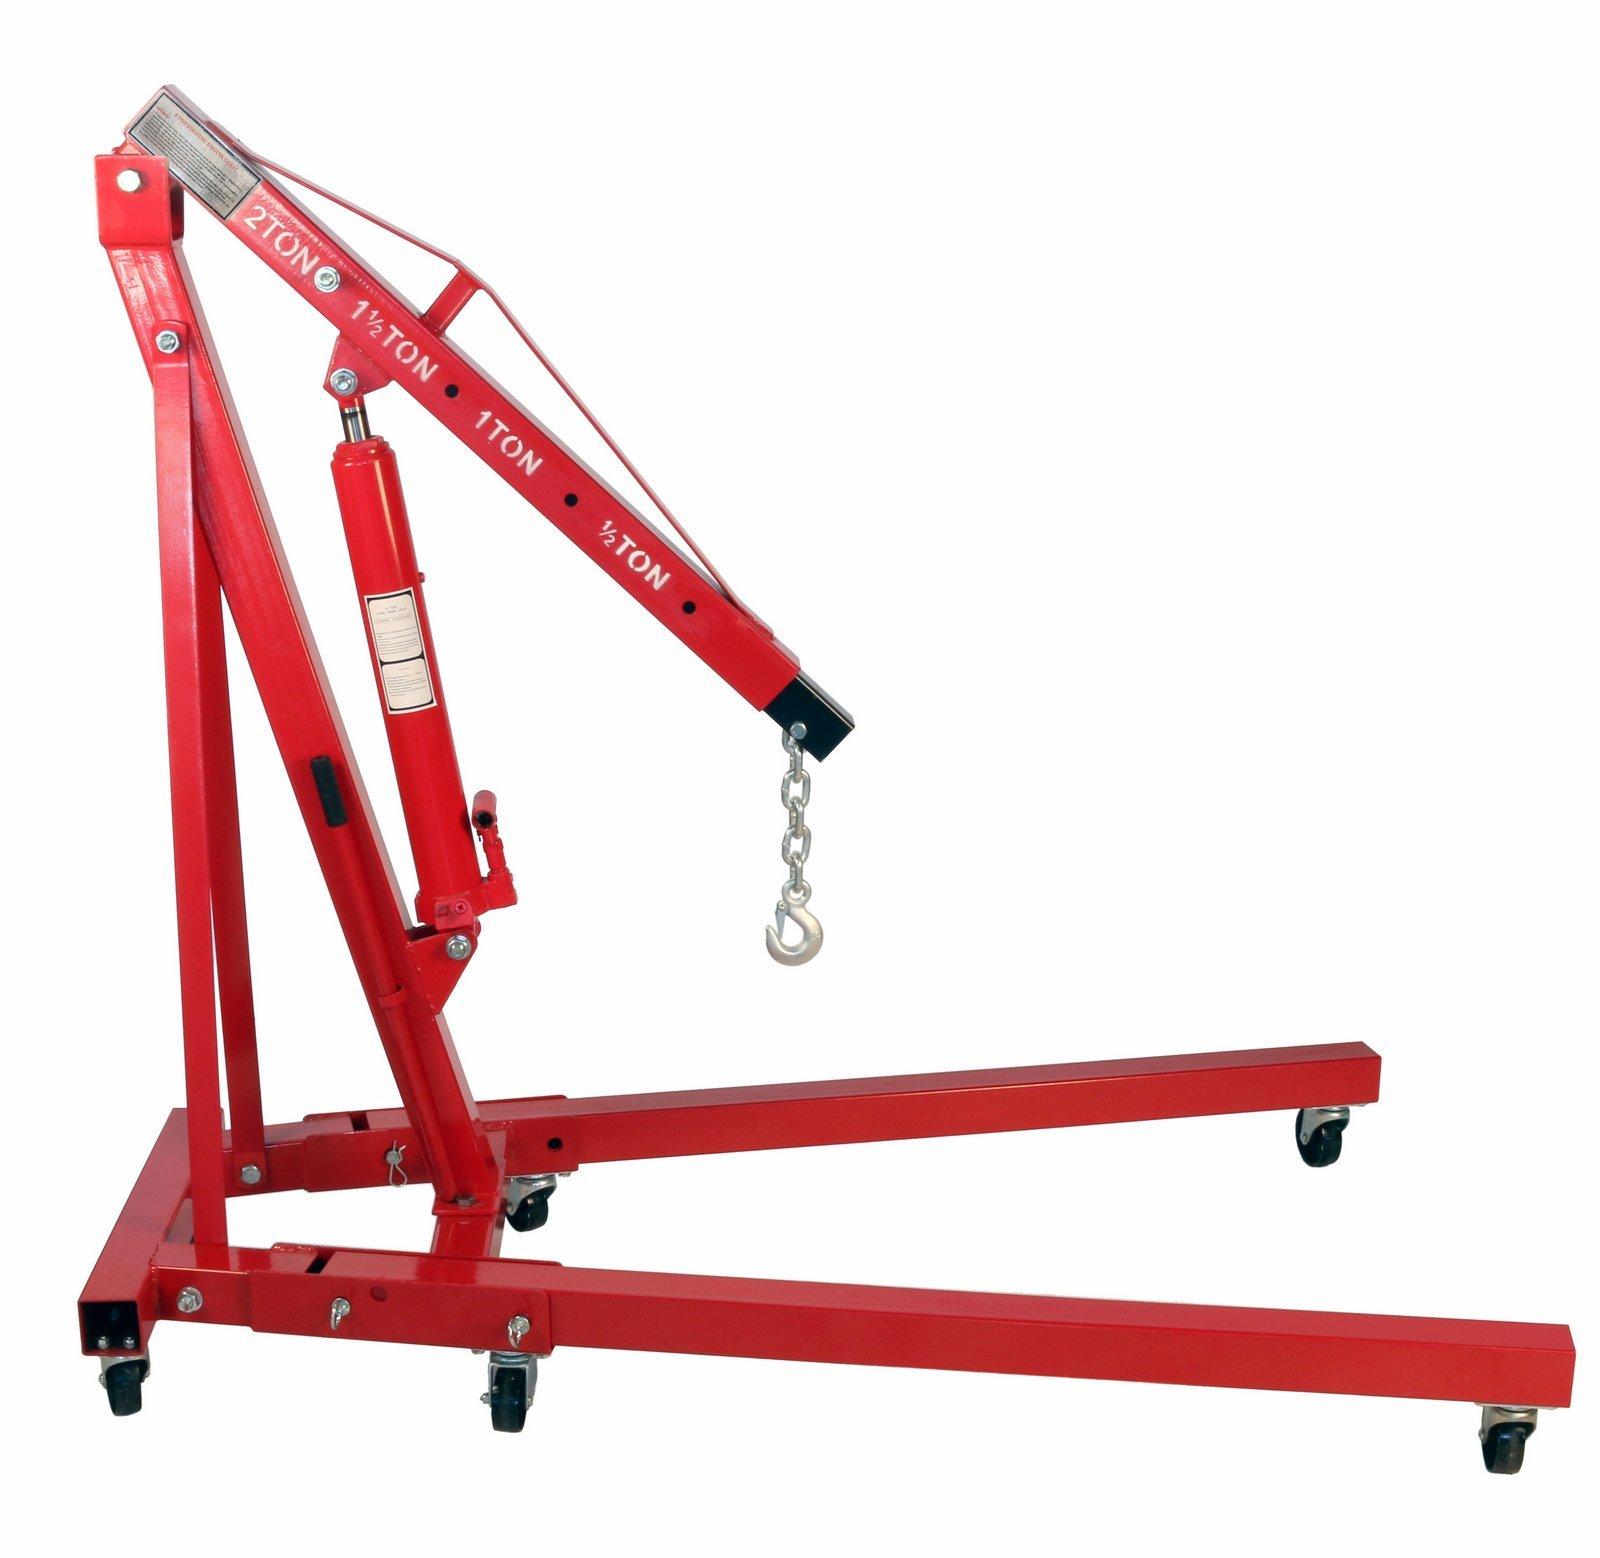 Dragway Tools 2 Ton Folding Hydraulic Engine Hoist Cherry Picker Shop Crane Hoist Lift by Dragway Tools (Image #1)